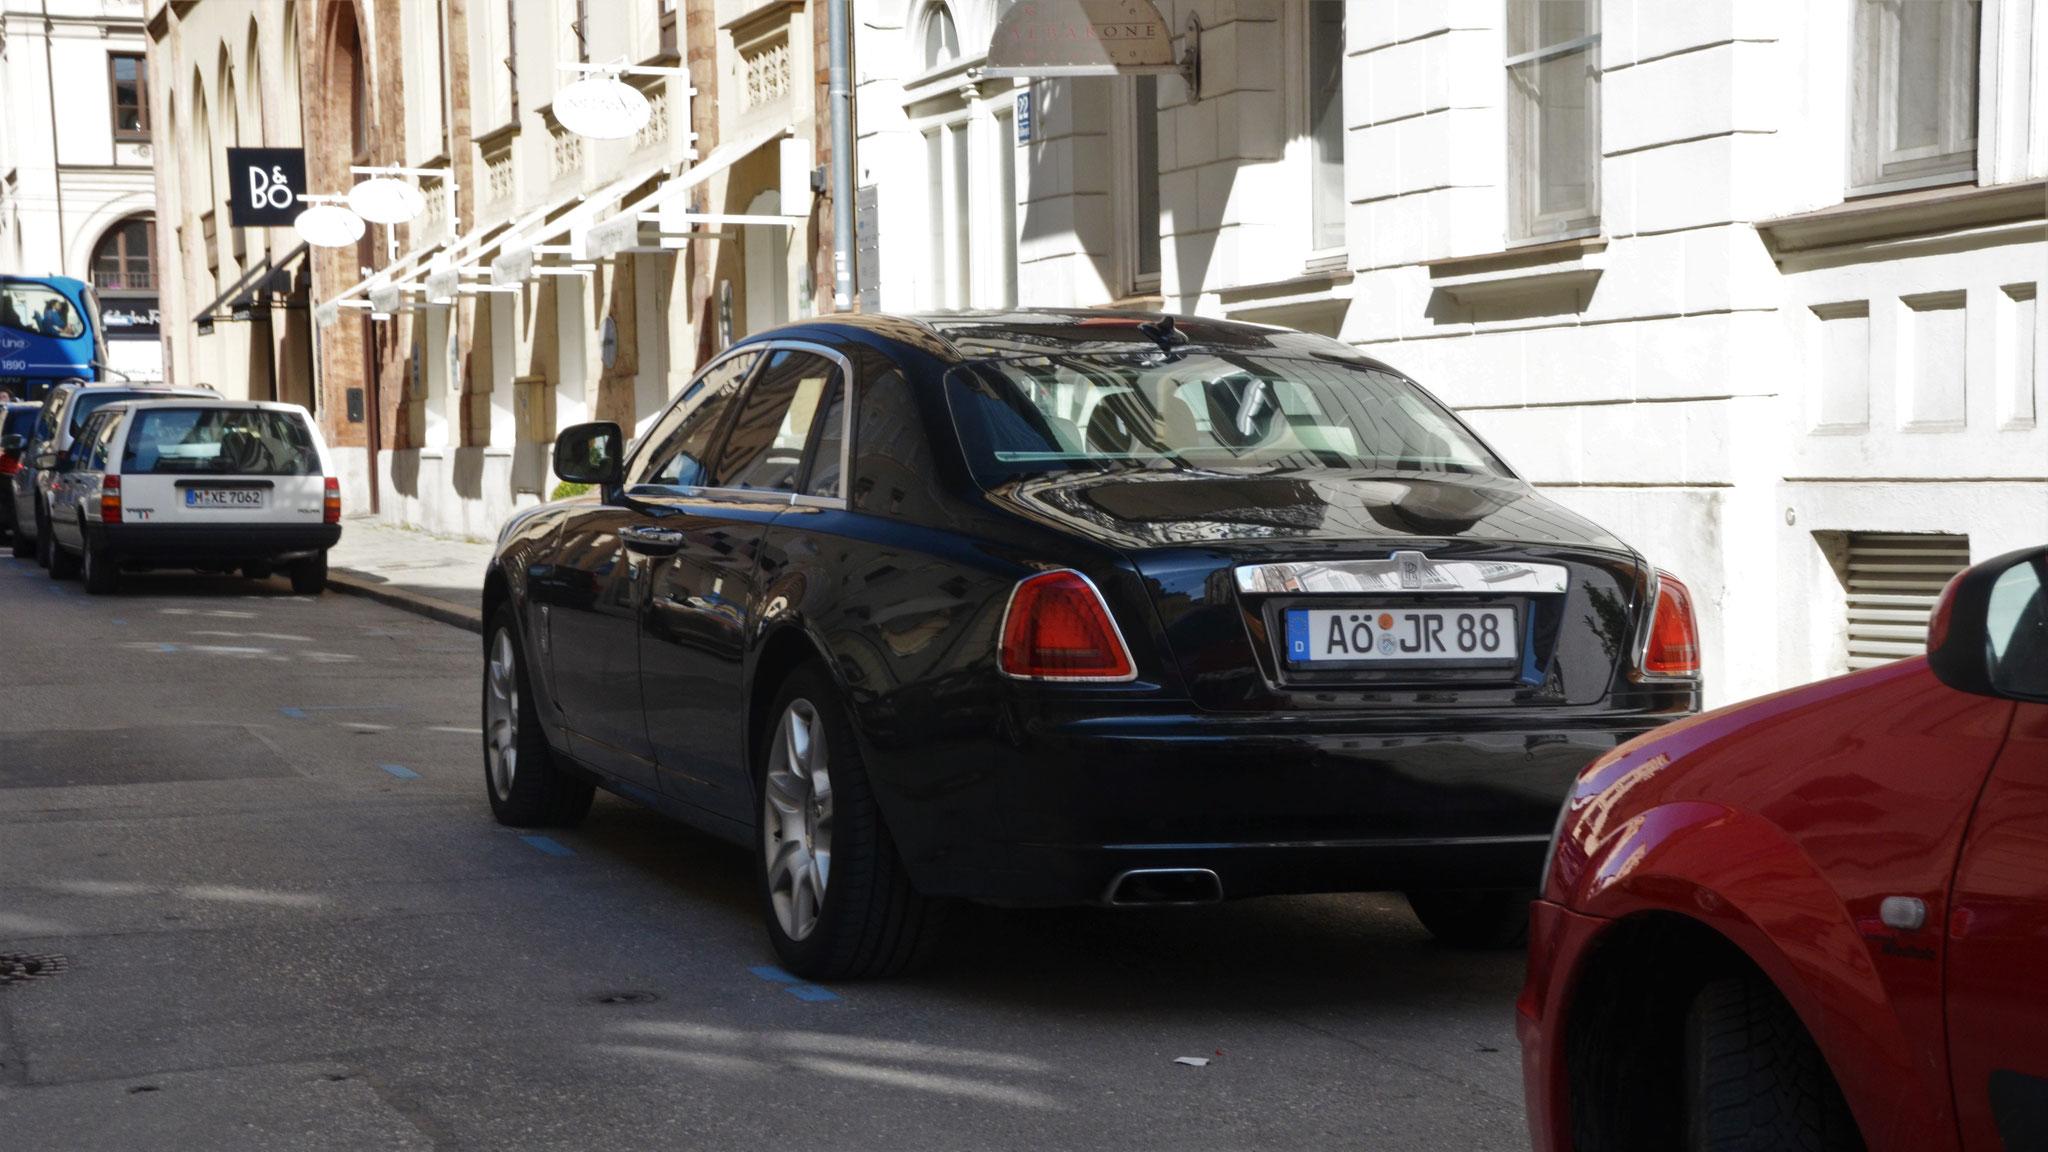 Rolls Royce Ghost - AÖ-JR-88